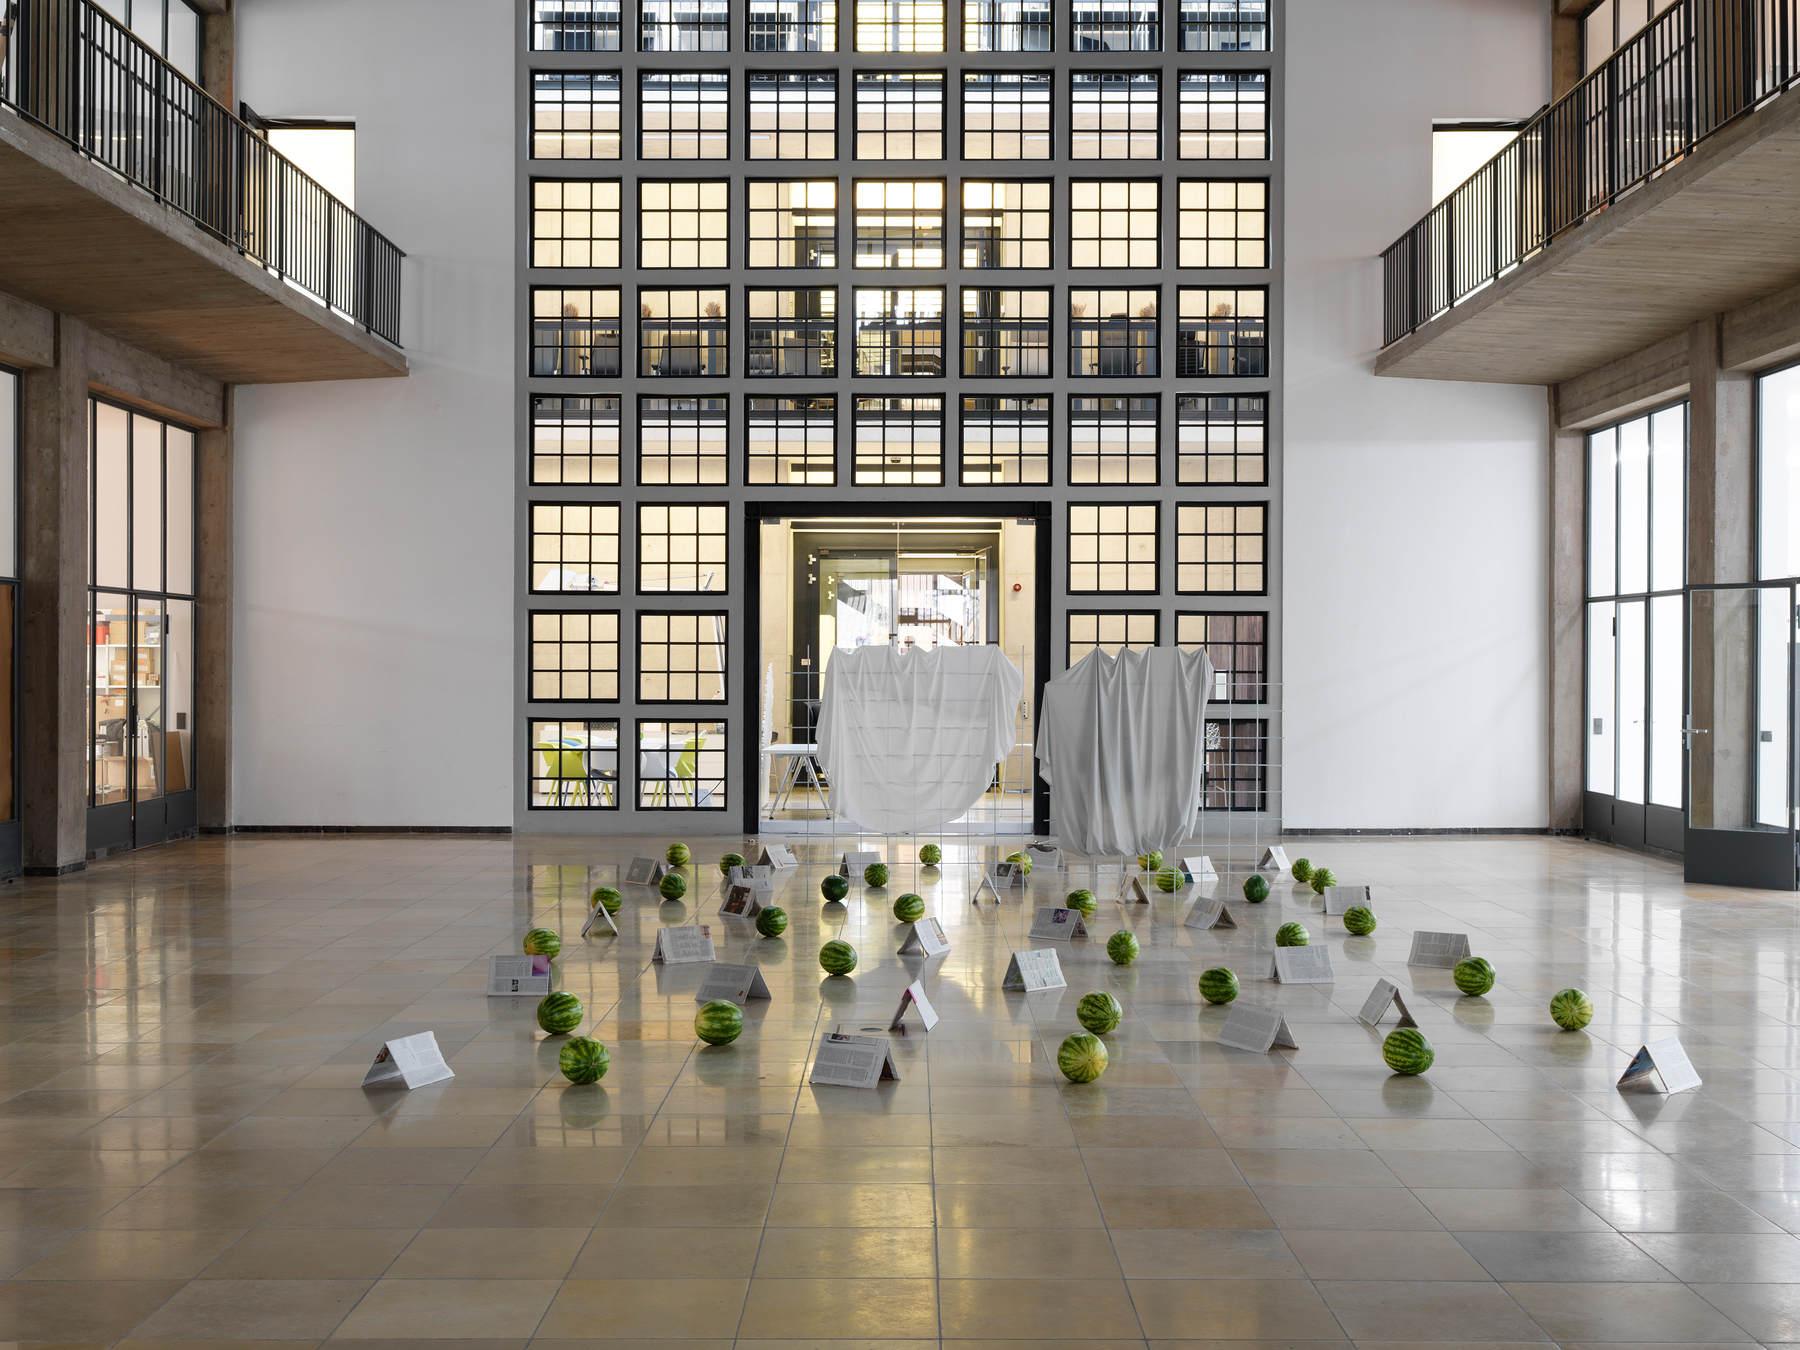 01_Edit Oderbolz_Kunstverein Nürnberg_2017